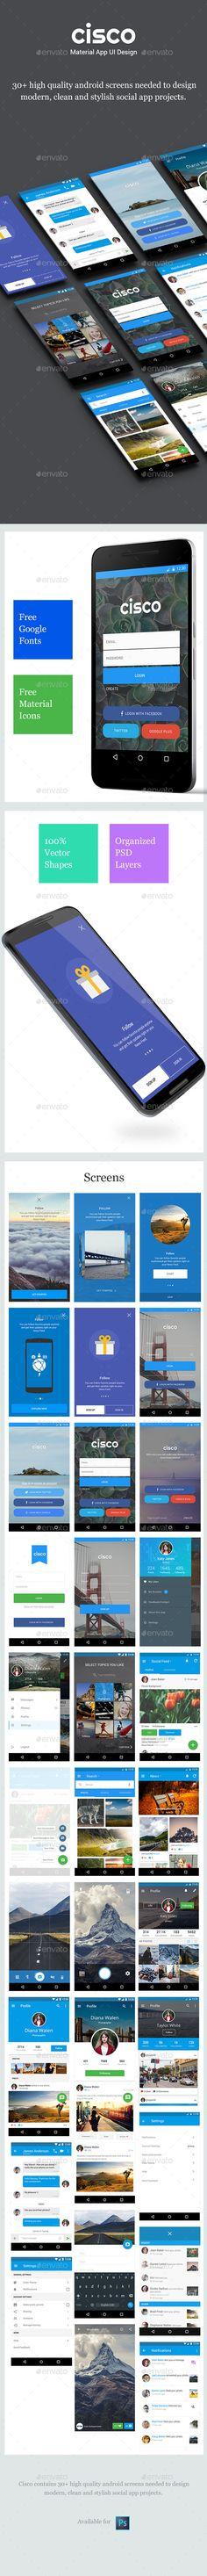 Material App UI Design - Cisco - User Interfaces Web Elements